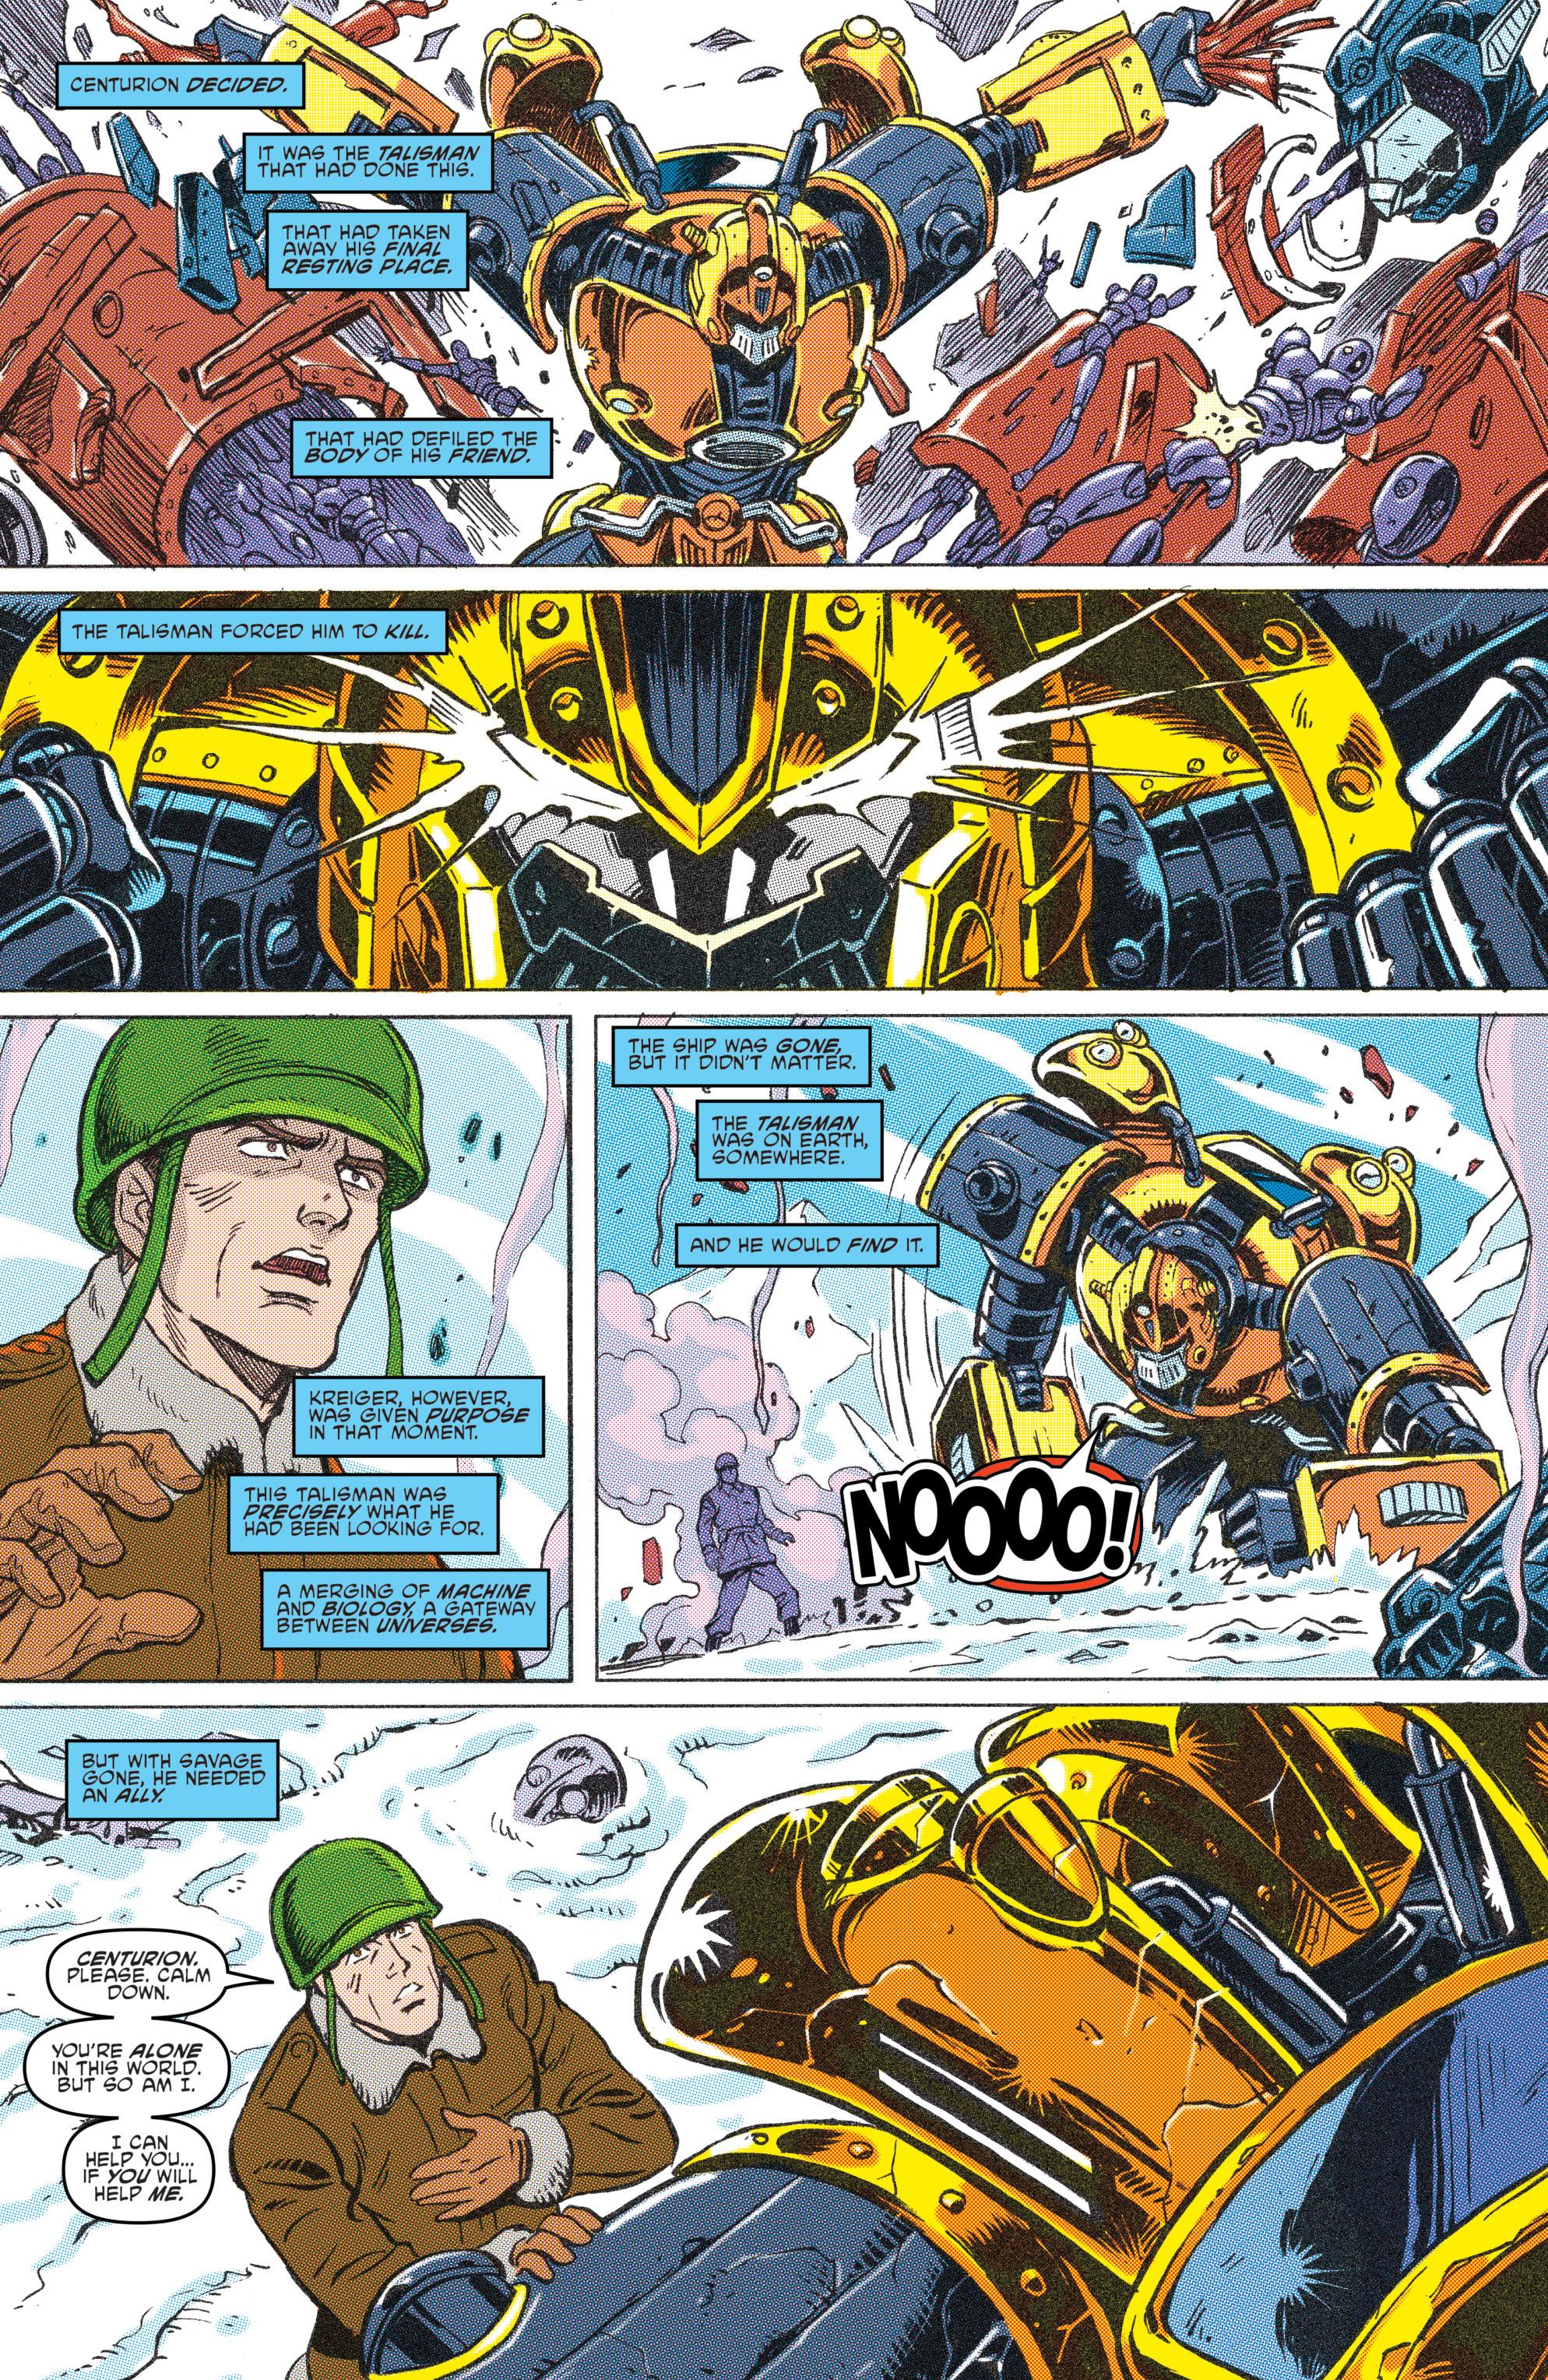 Read online Revolutionaries comic -  Issue #5 - 21